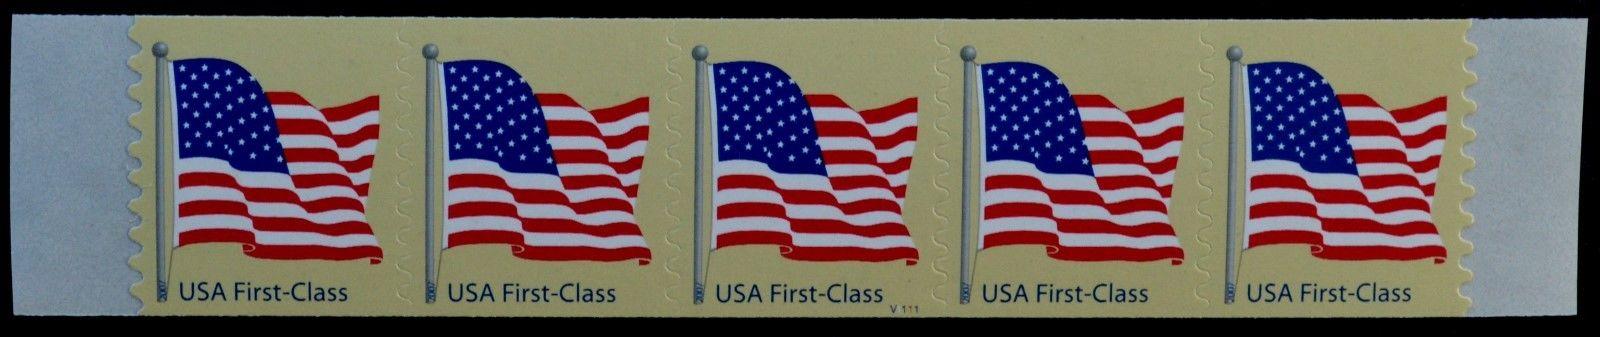 2007 Us Sc 4134 Flag Non Denom Pnc5 Pl V1111 Mnh See